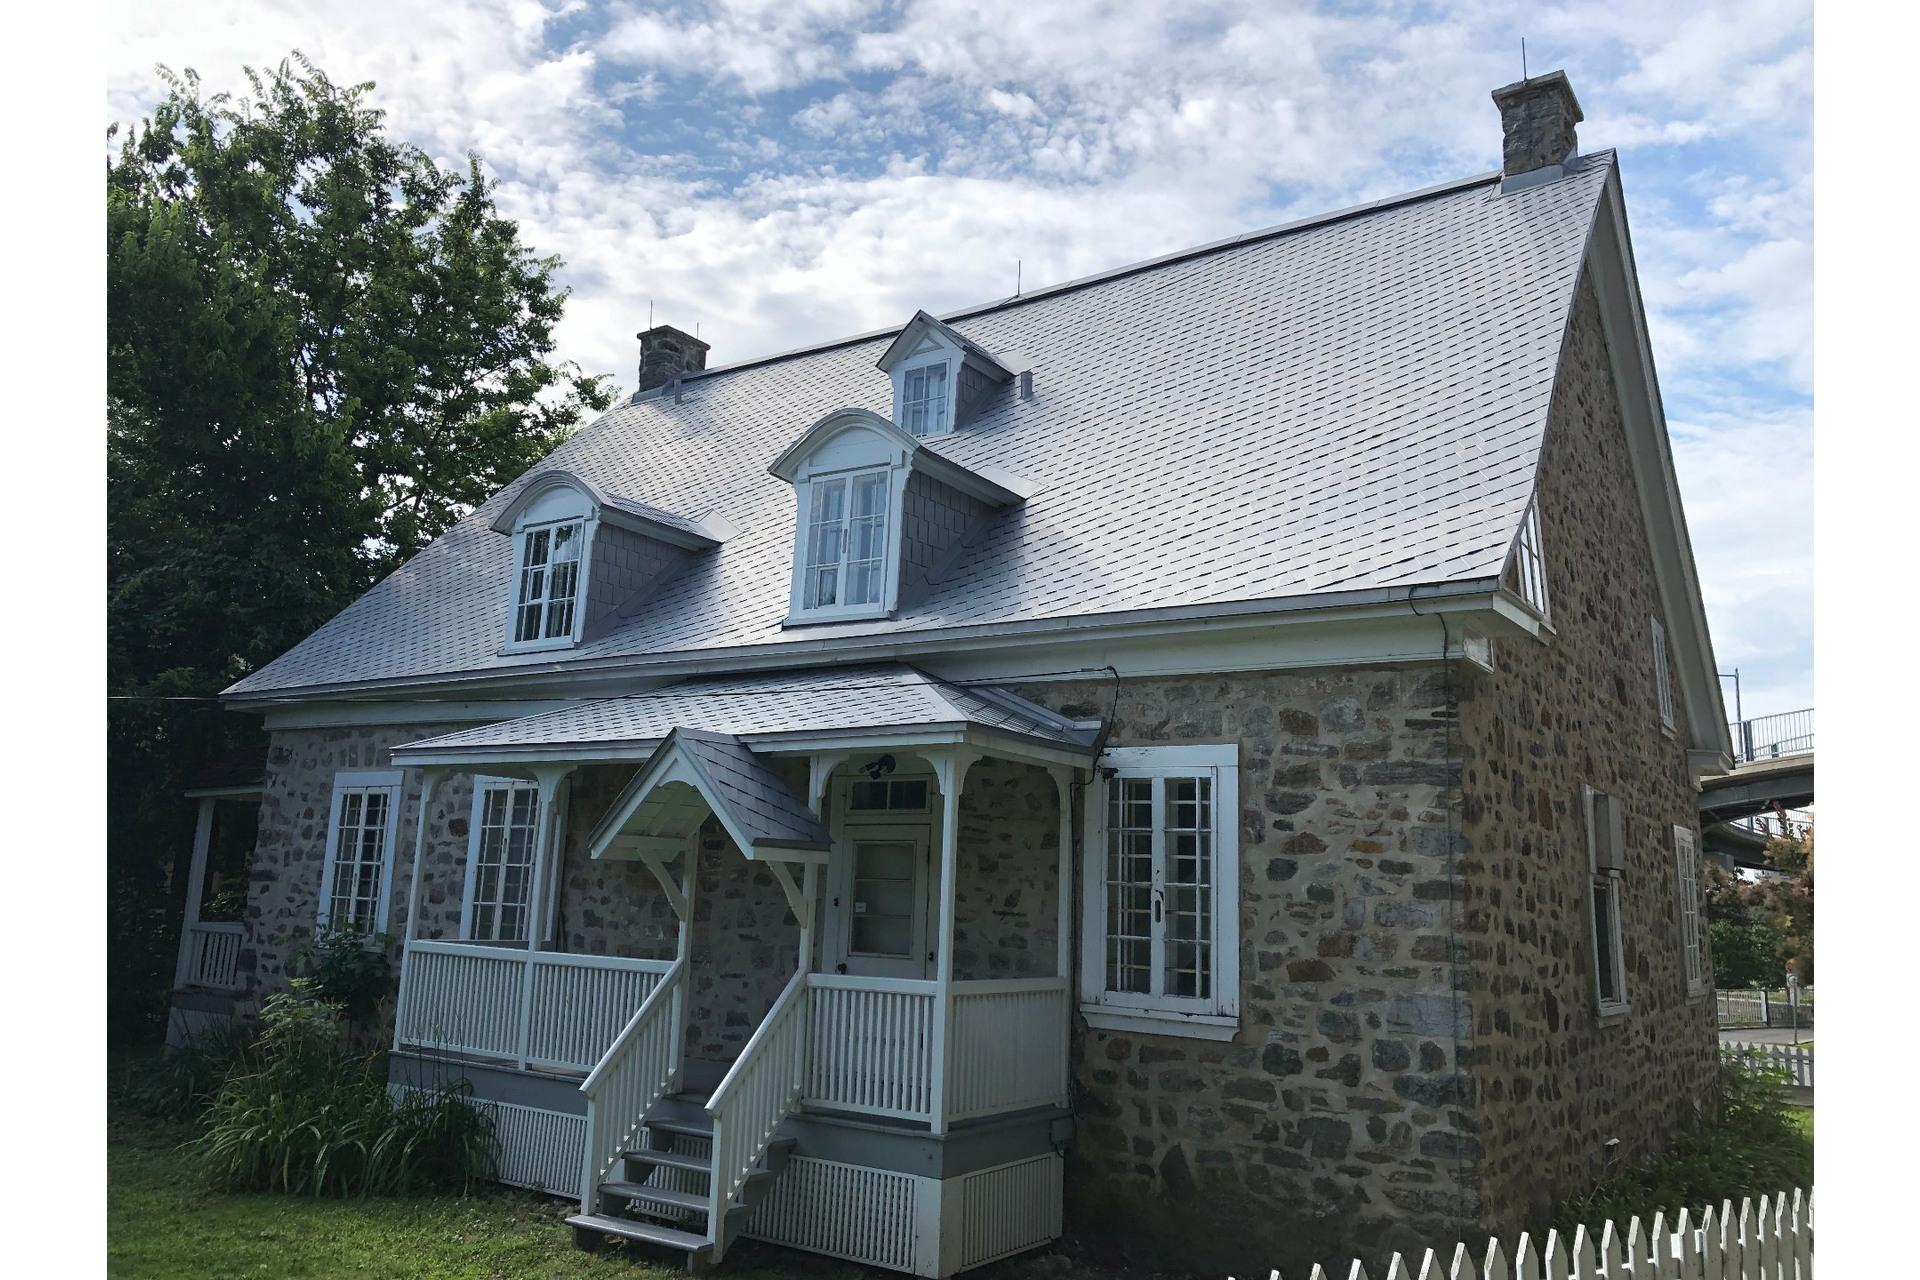 image 3 - 办公室 出售 Sainte-Anne-de-Bellevue